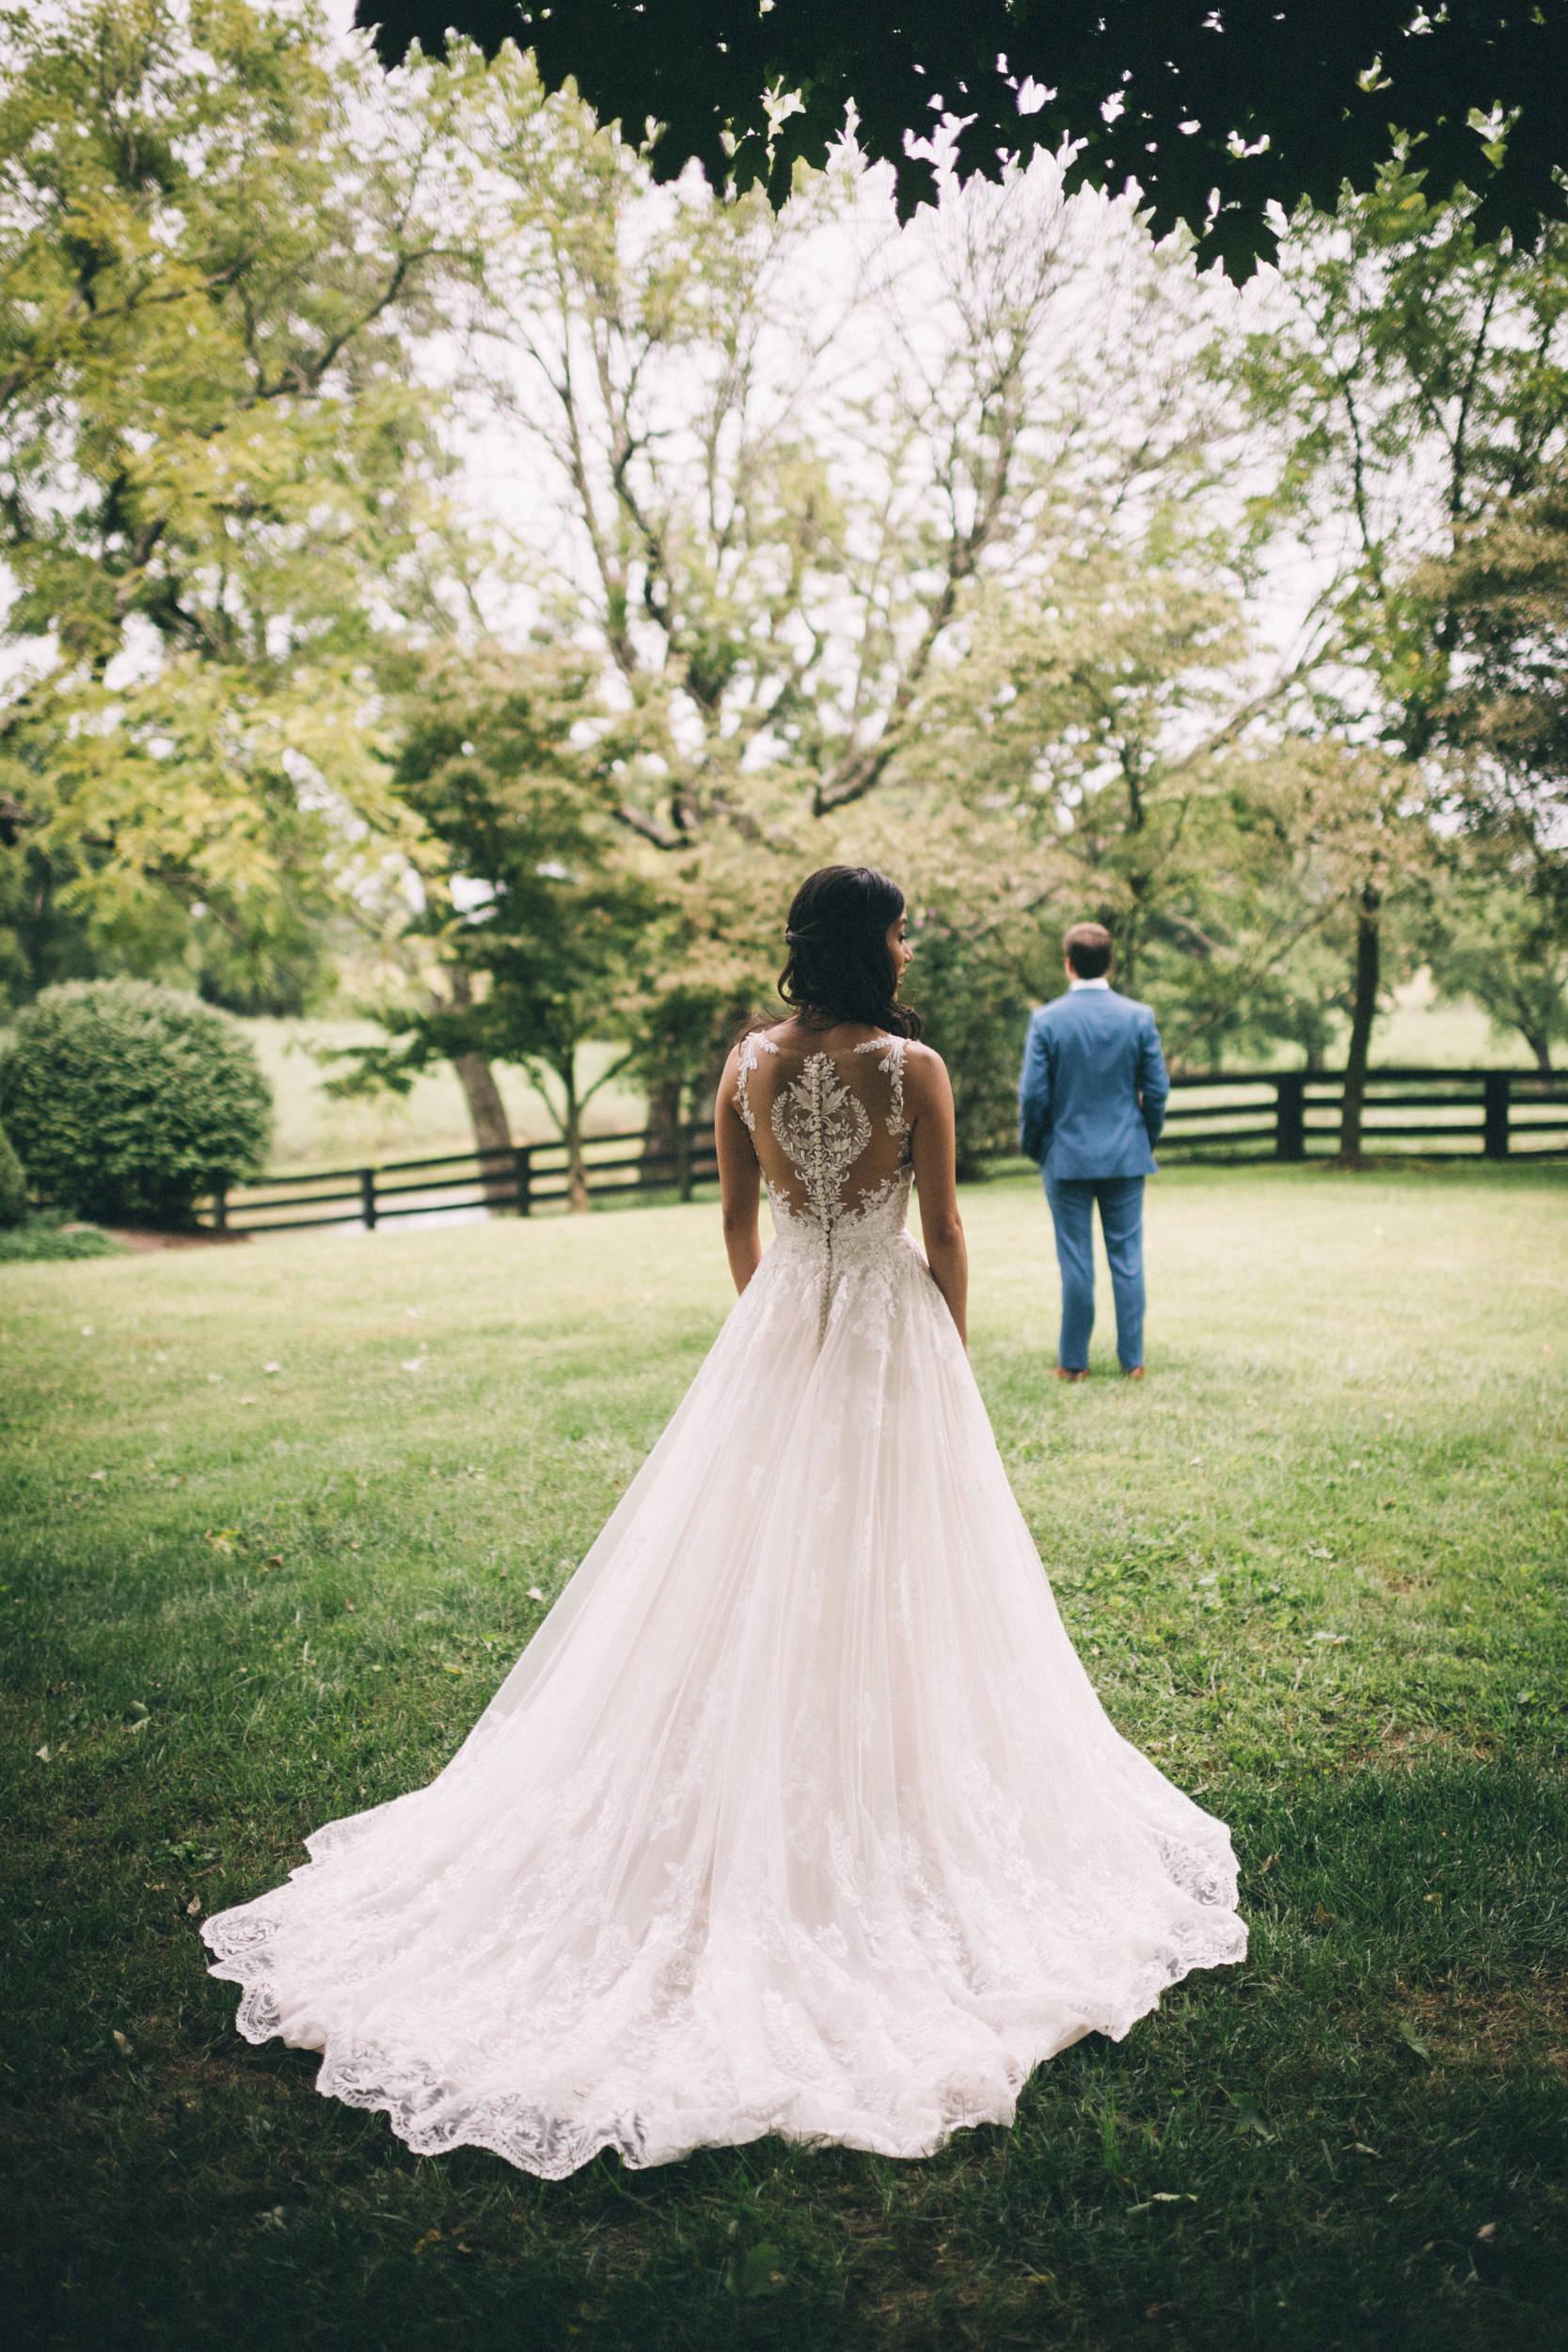 Louisville-Kentucky-Wedding-and-Elopement-Photographer-Sarah-Katherine-Davis-Photography-Summer-Jewel-Toned-Wedding-Chineese-Tea-Ceremony-Warrenwood-Manor-Danville-159.jpg